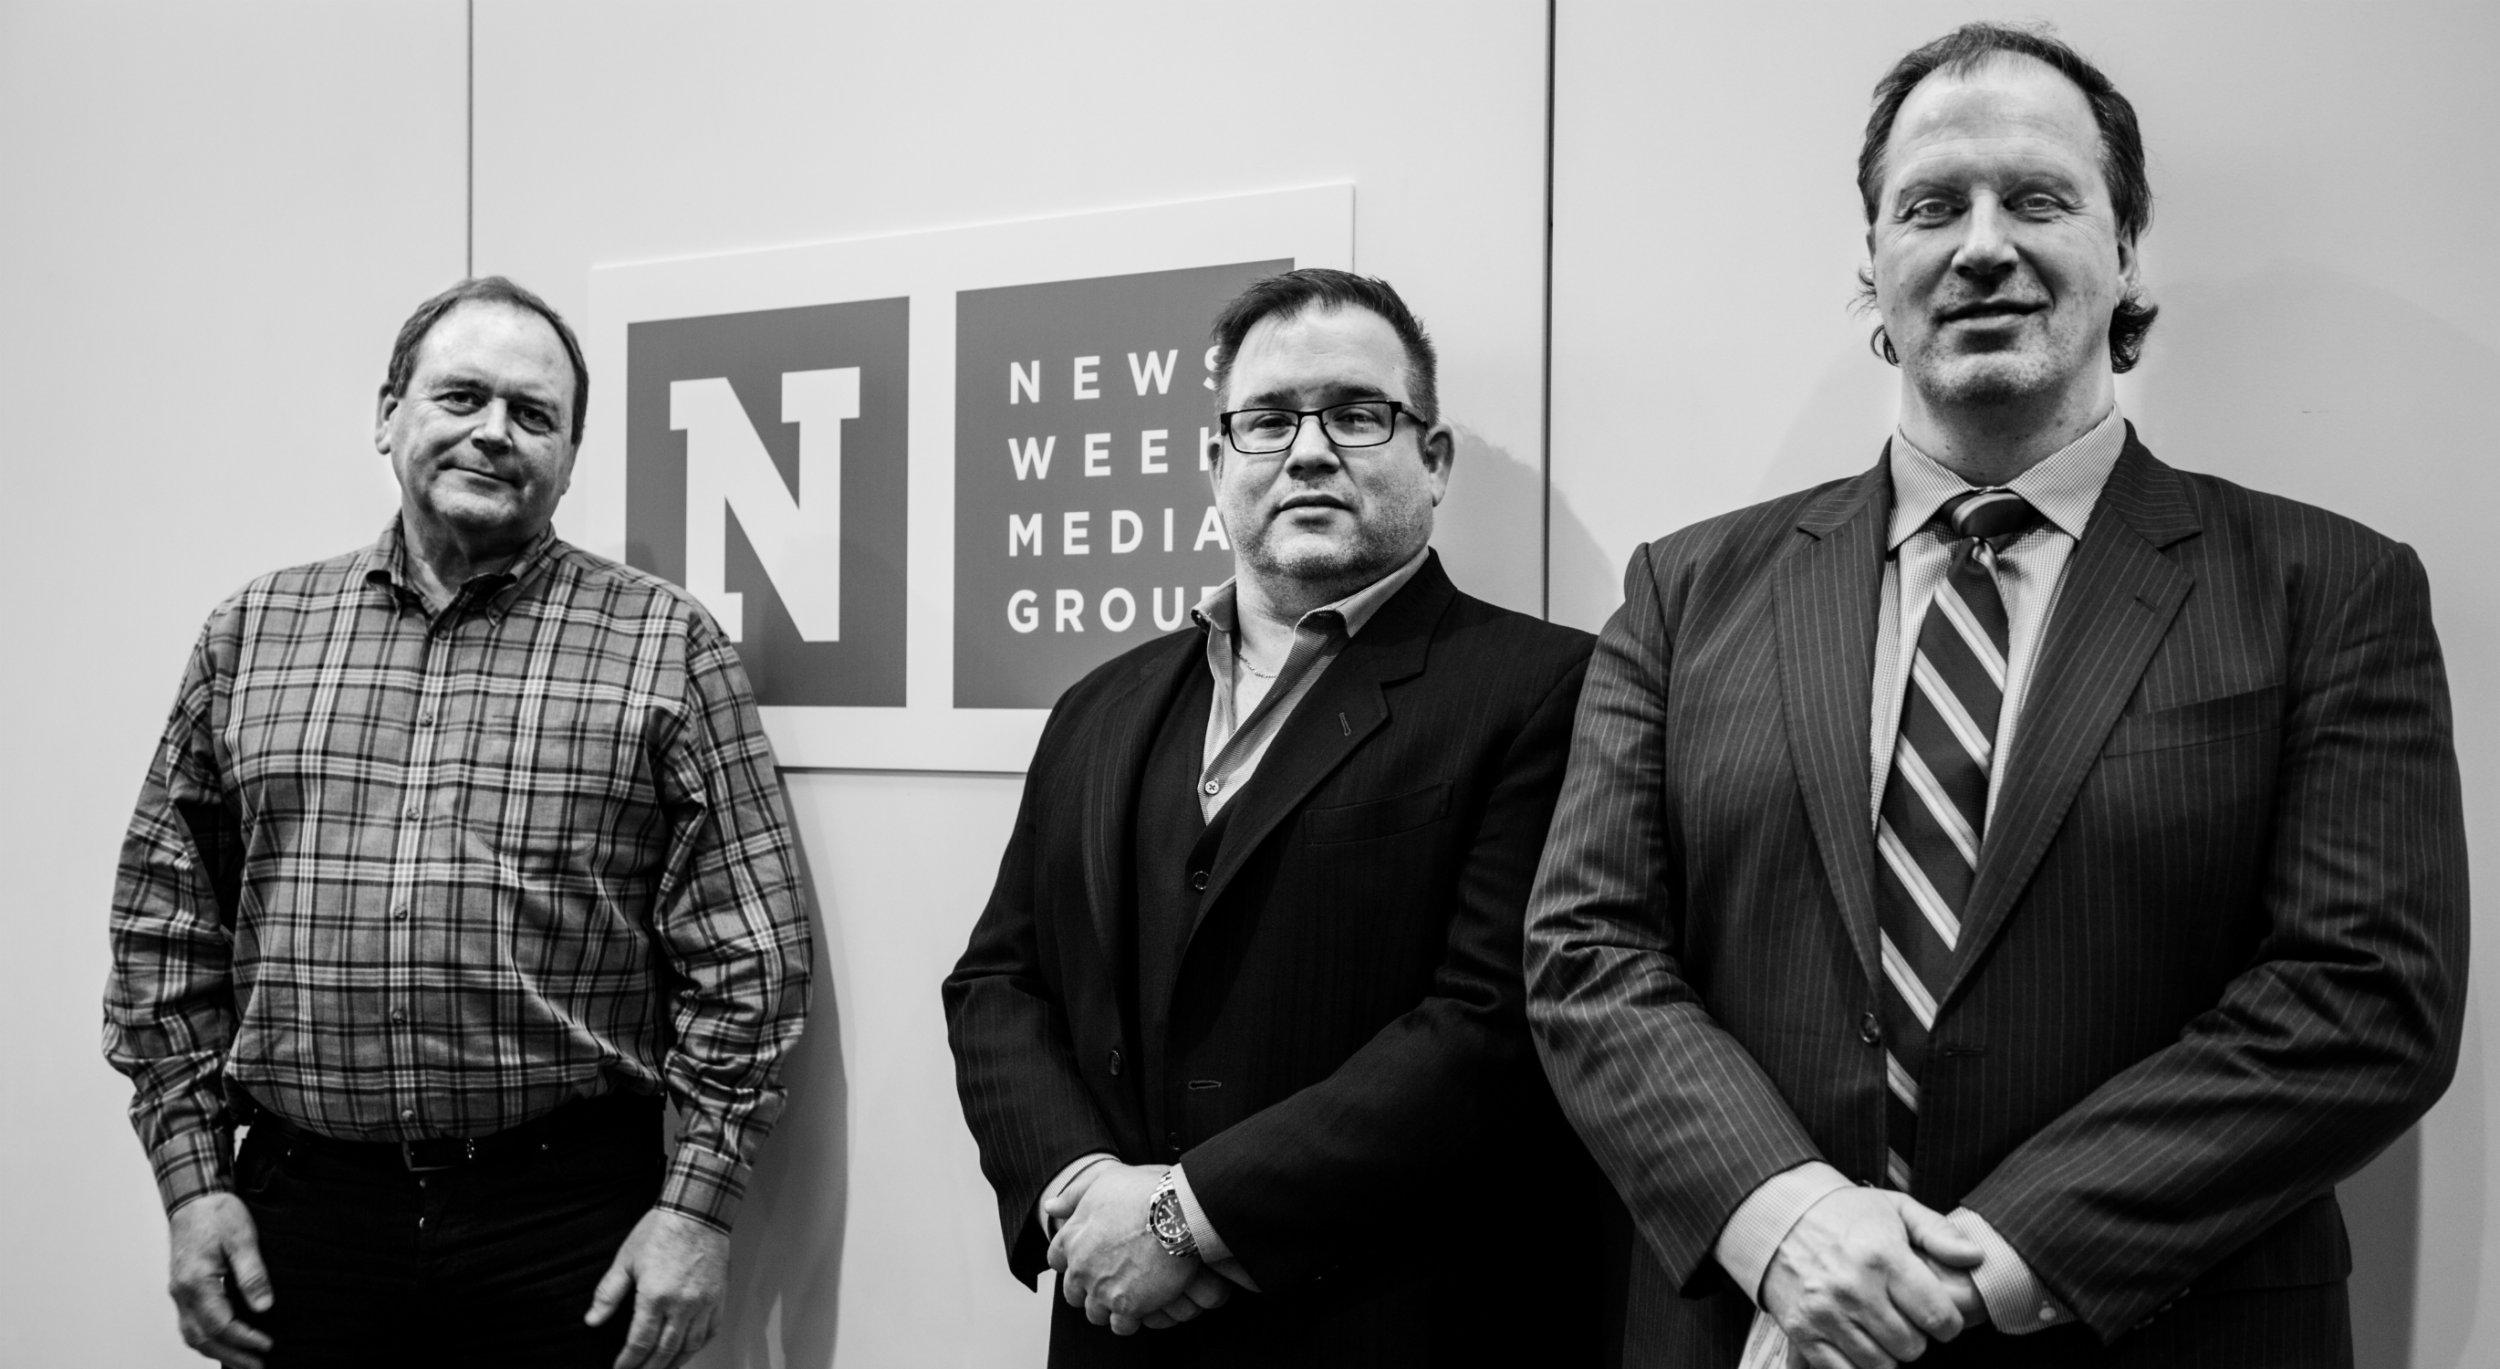 Impact Wrestling executives Ed Nordholm, Scott D'Amore and Don Callis